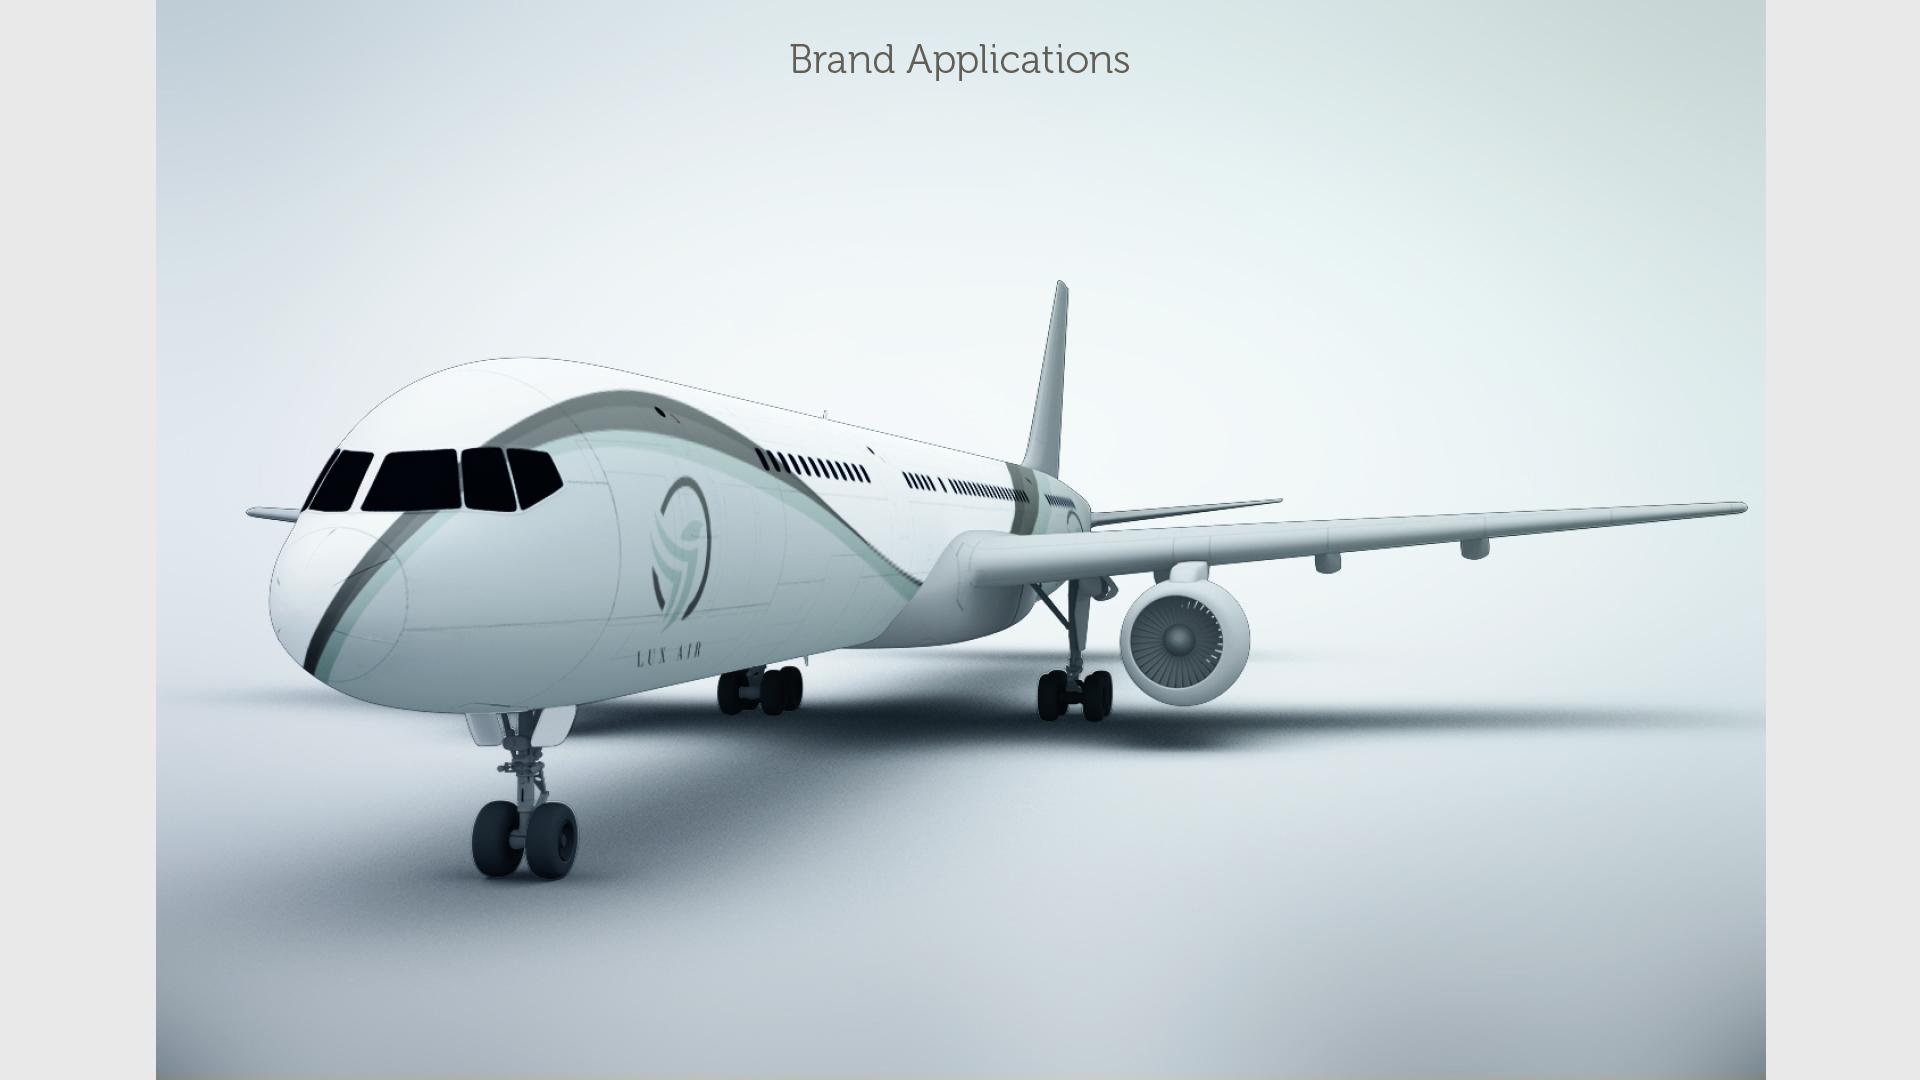 Brand Applications